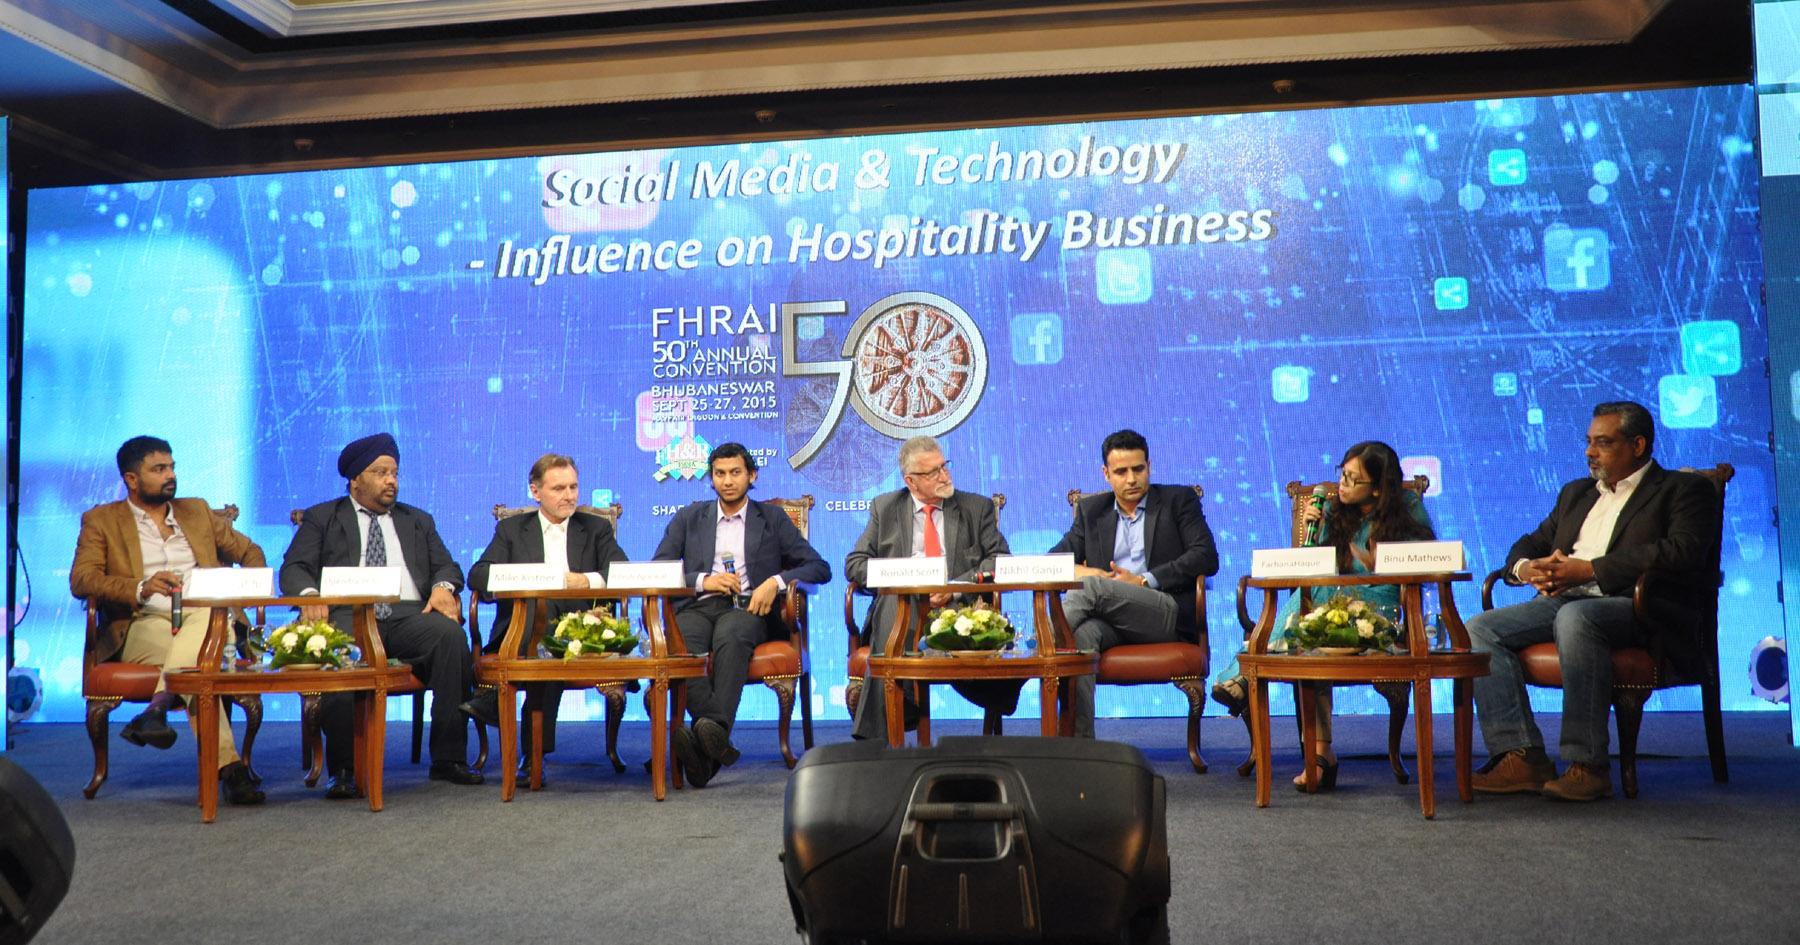 Social Media & Technology - Influence on Hospitality Business (2)